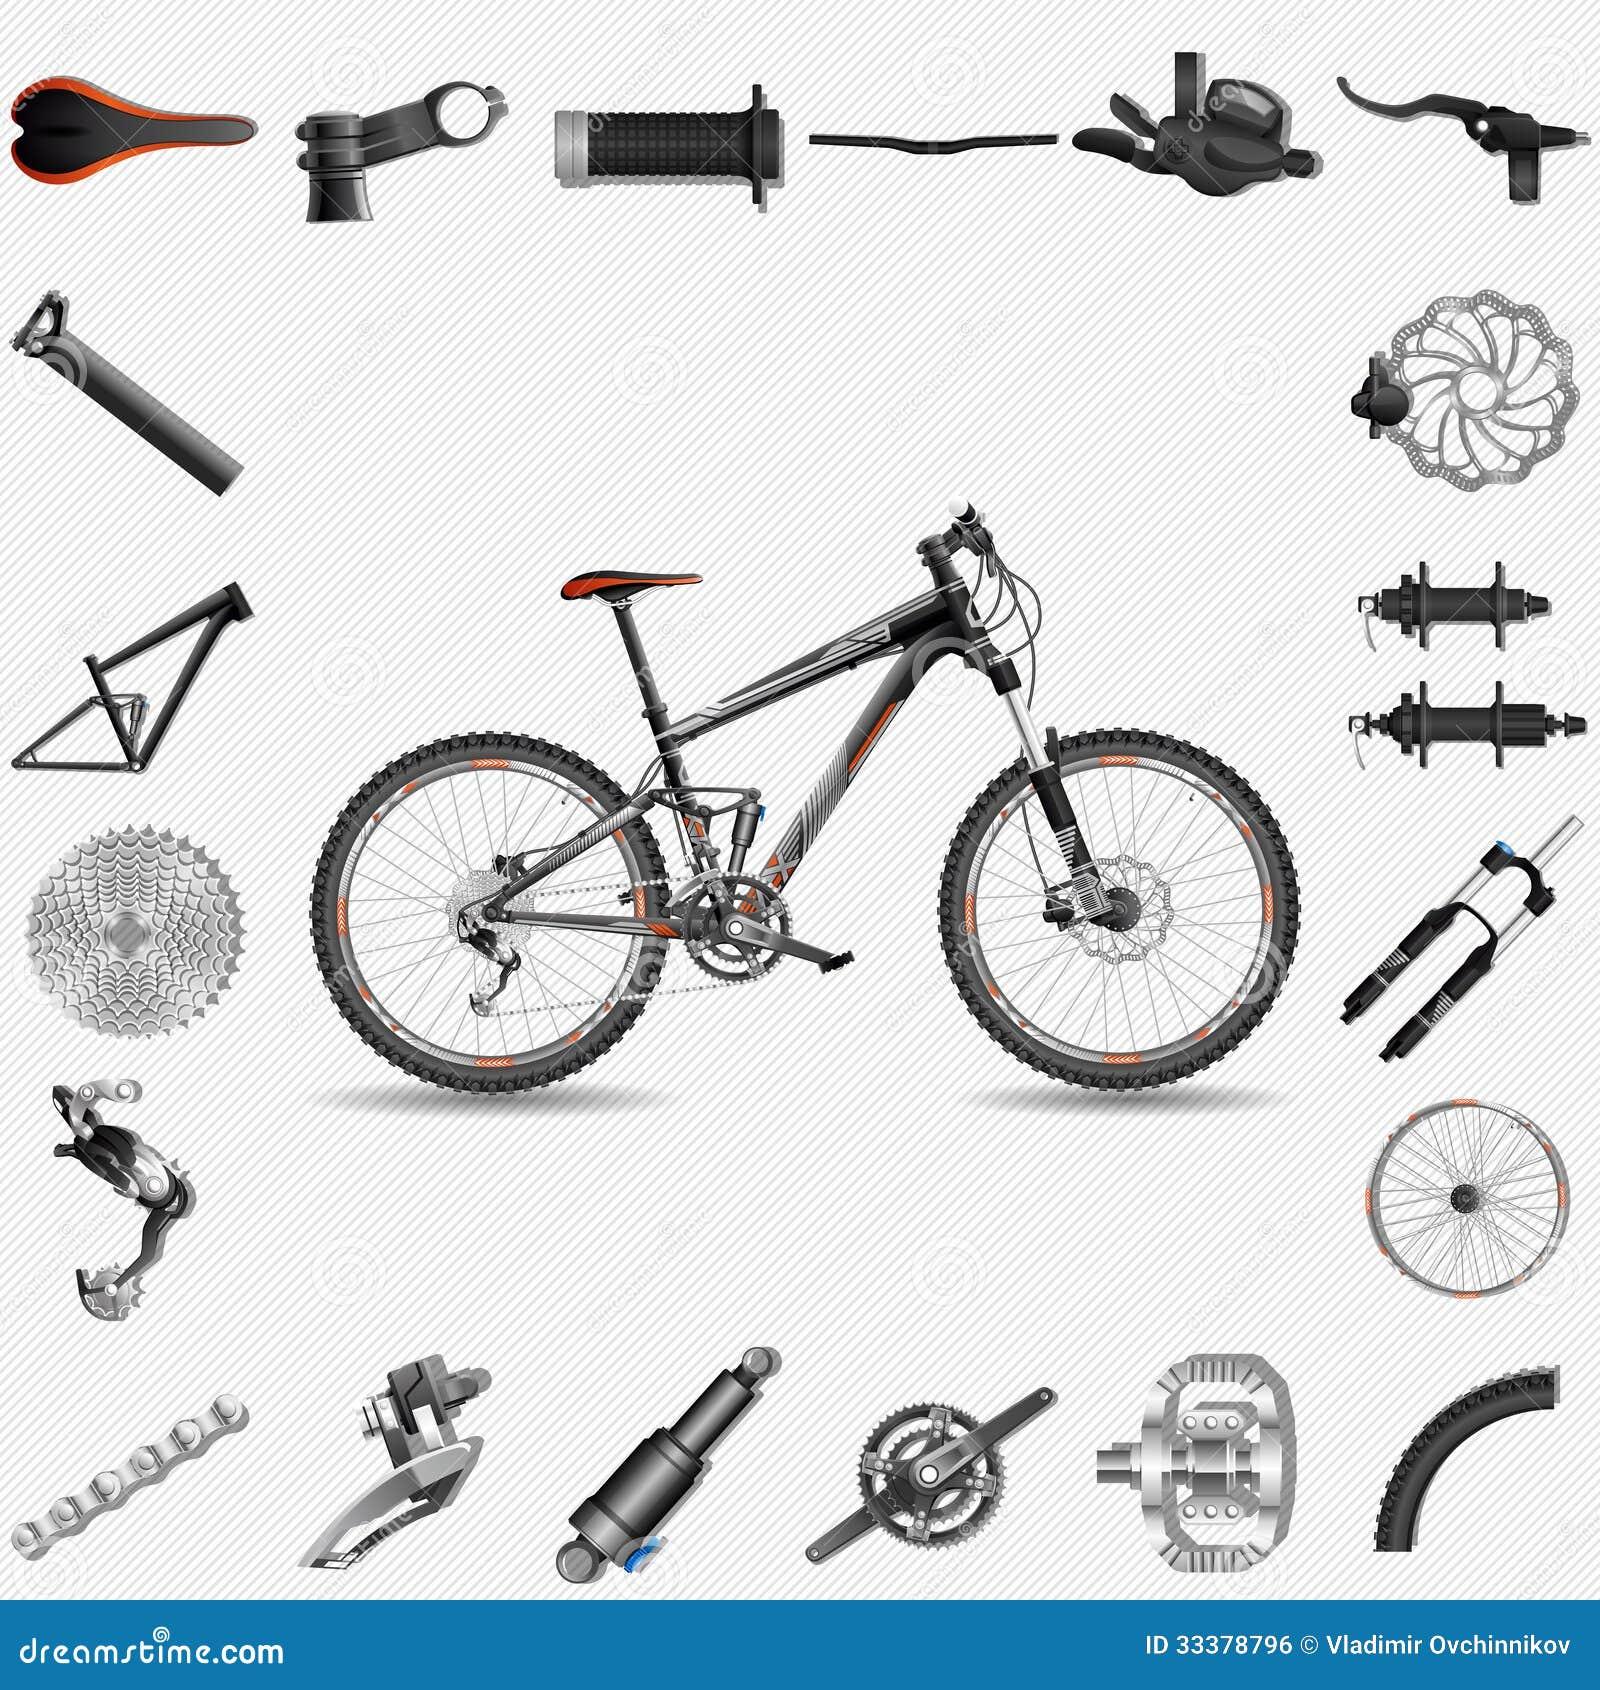 Full Suspension Mountain Bike Stock Vector Illustration Of Spare